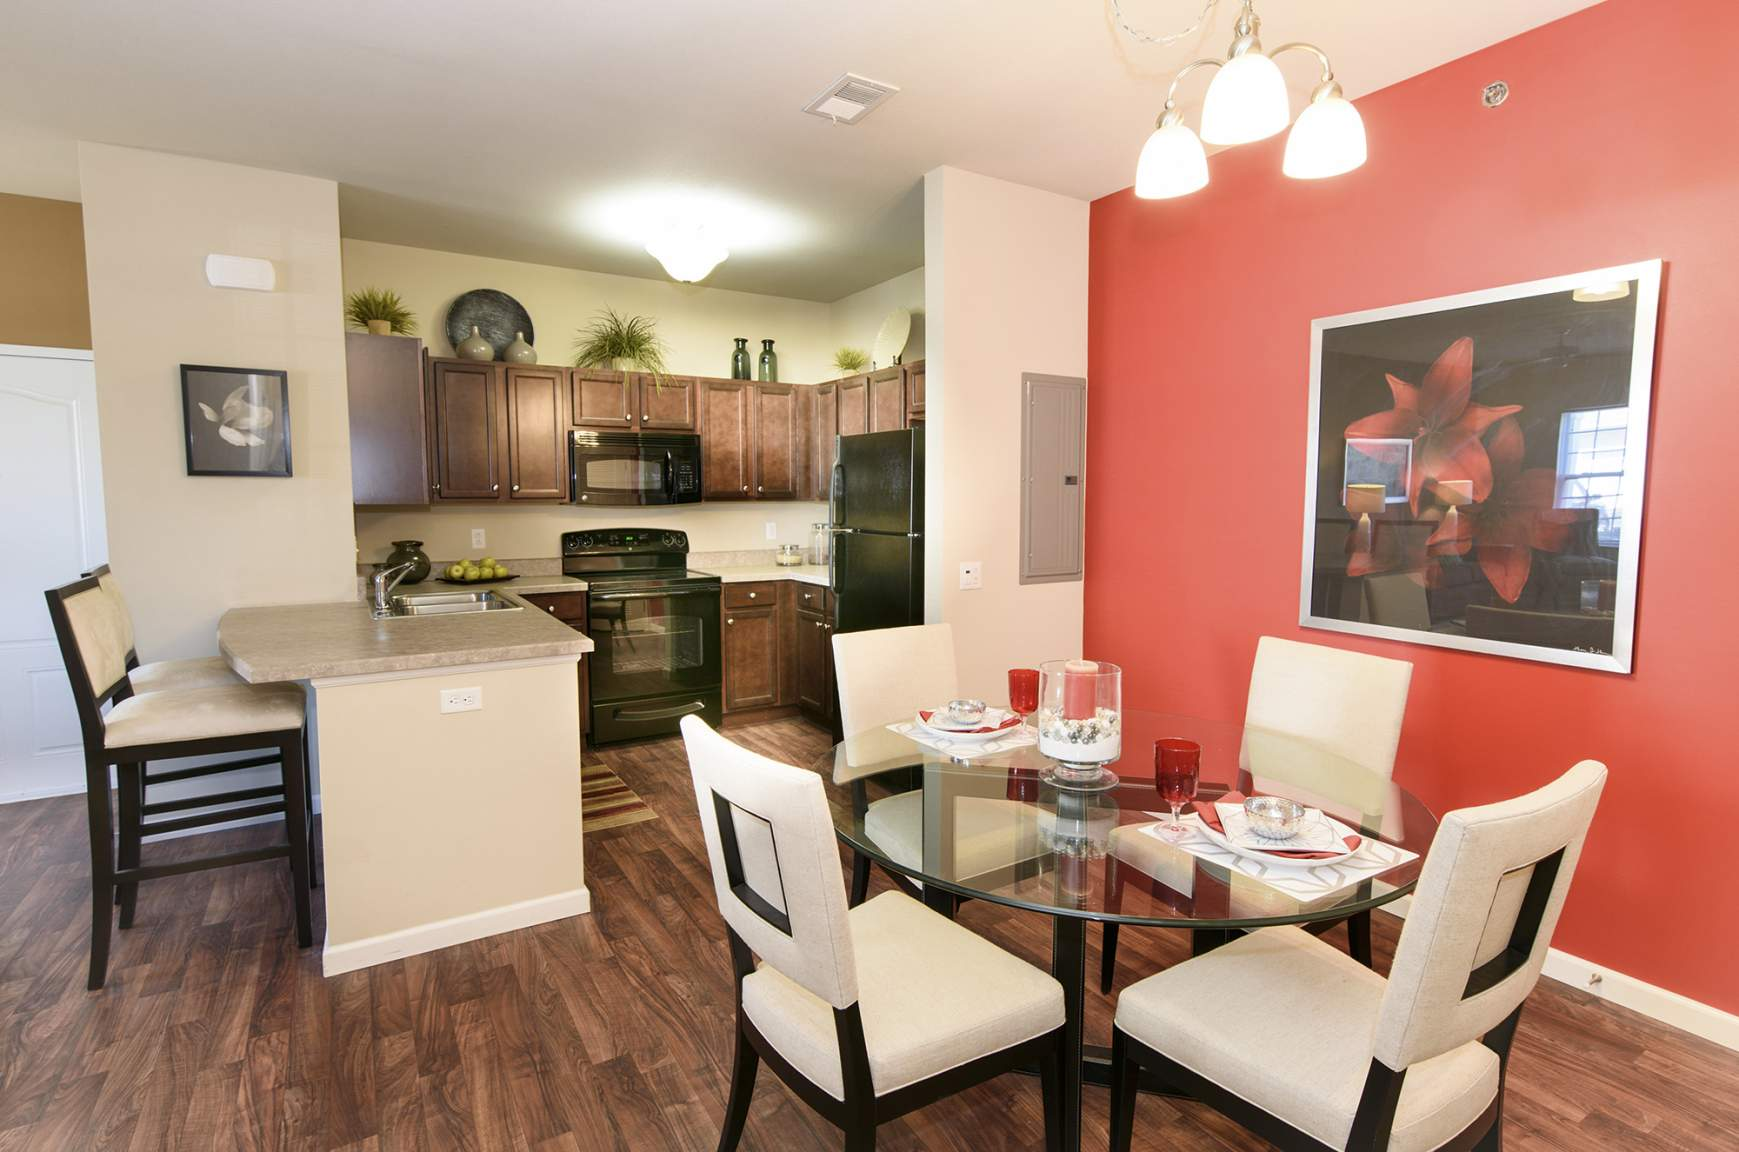 Miller-Valentine Residential Property